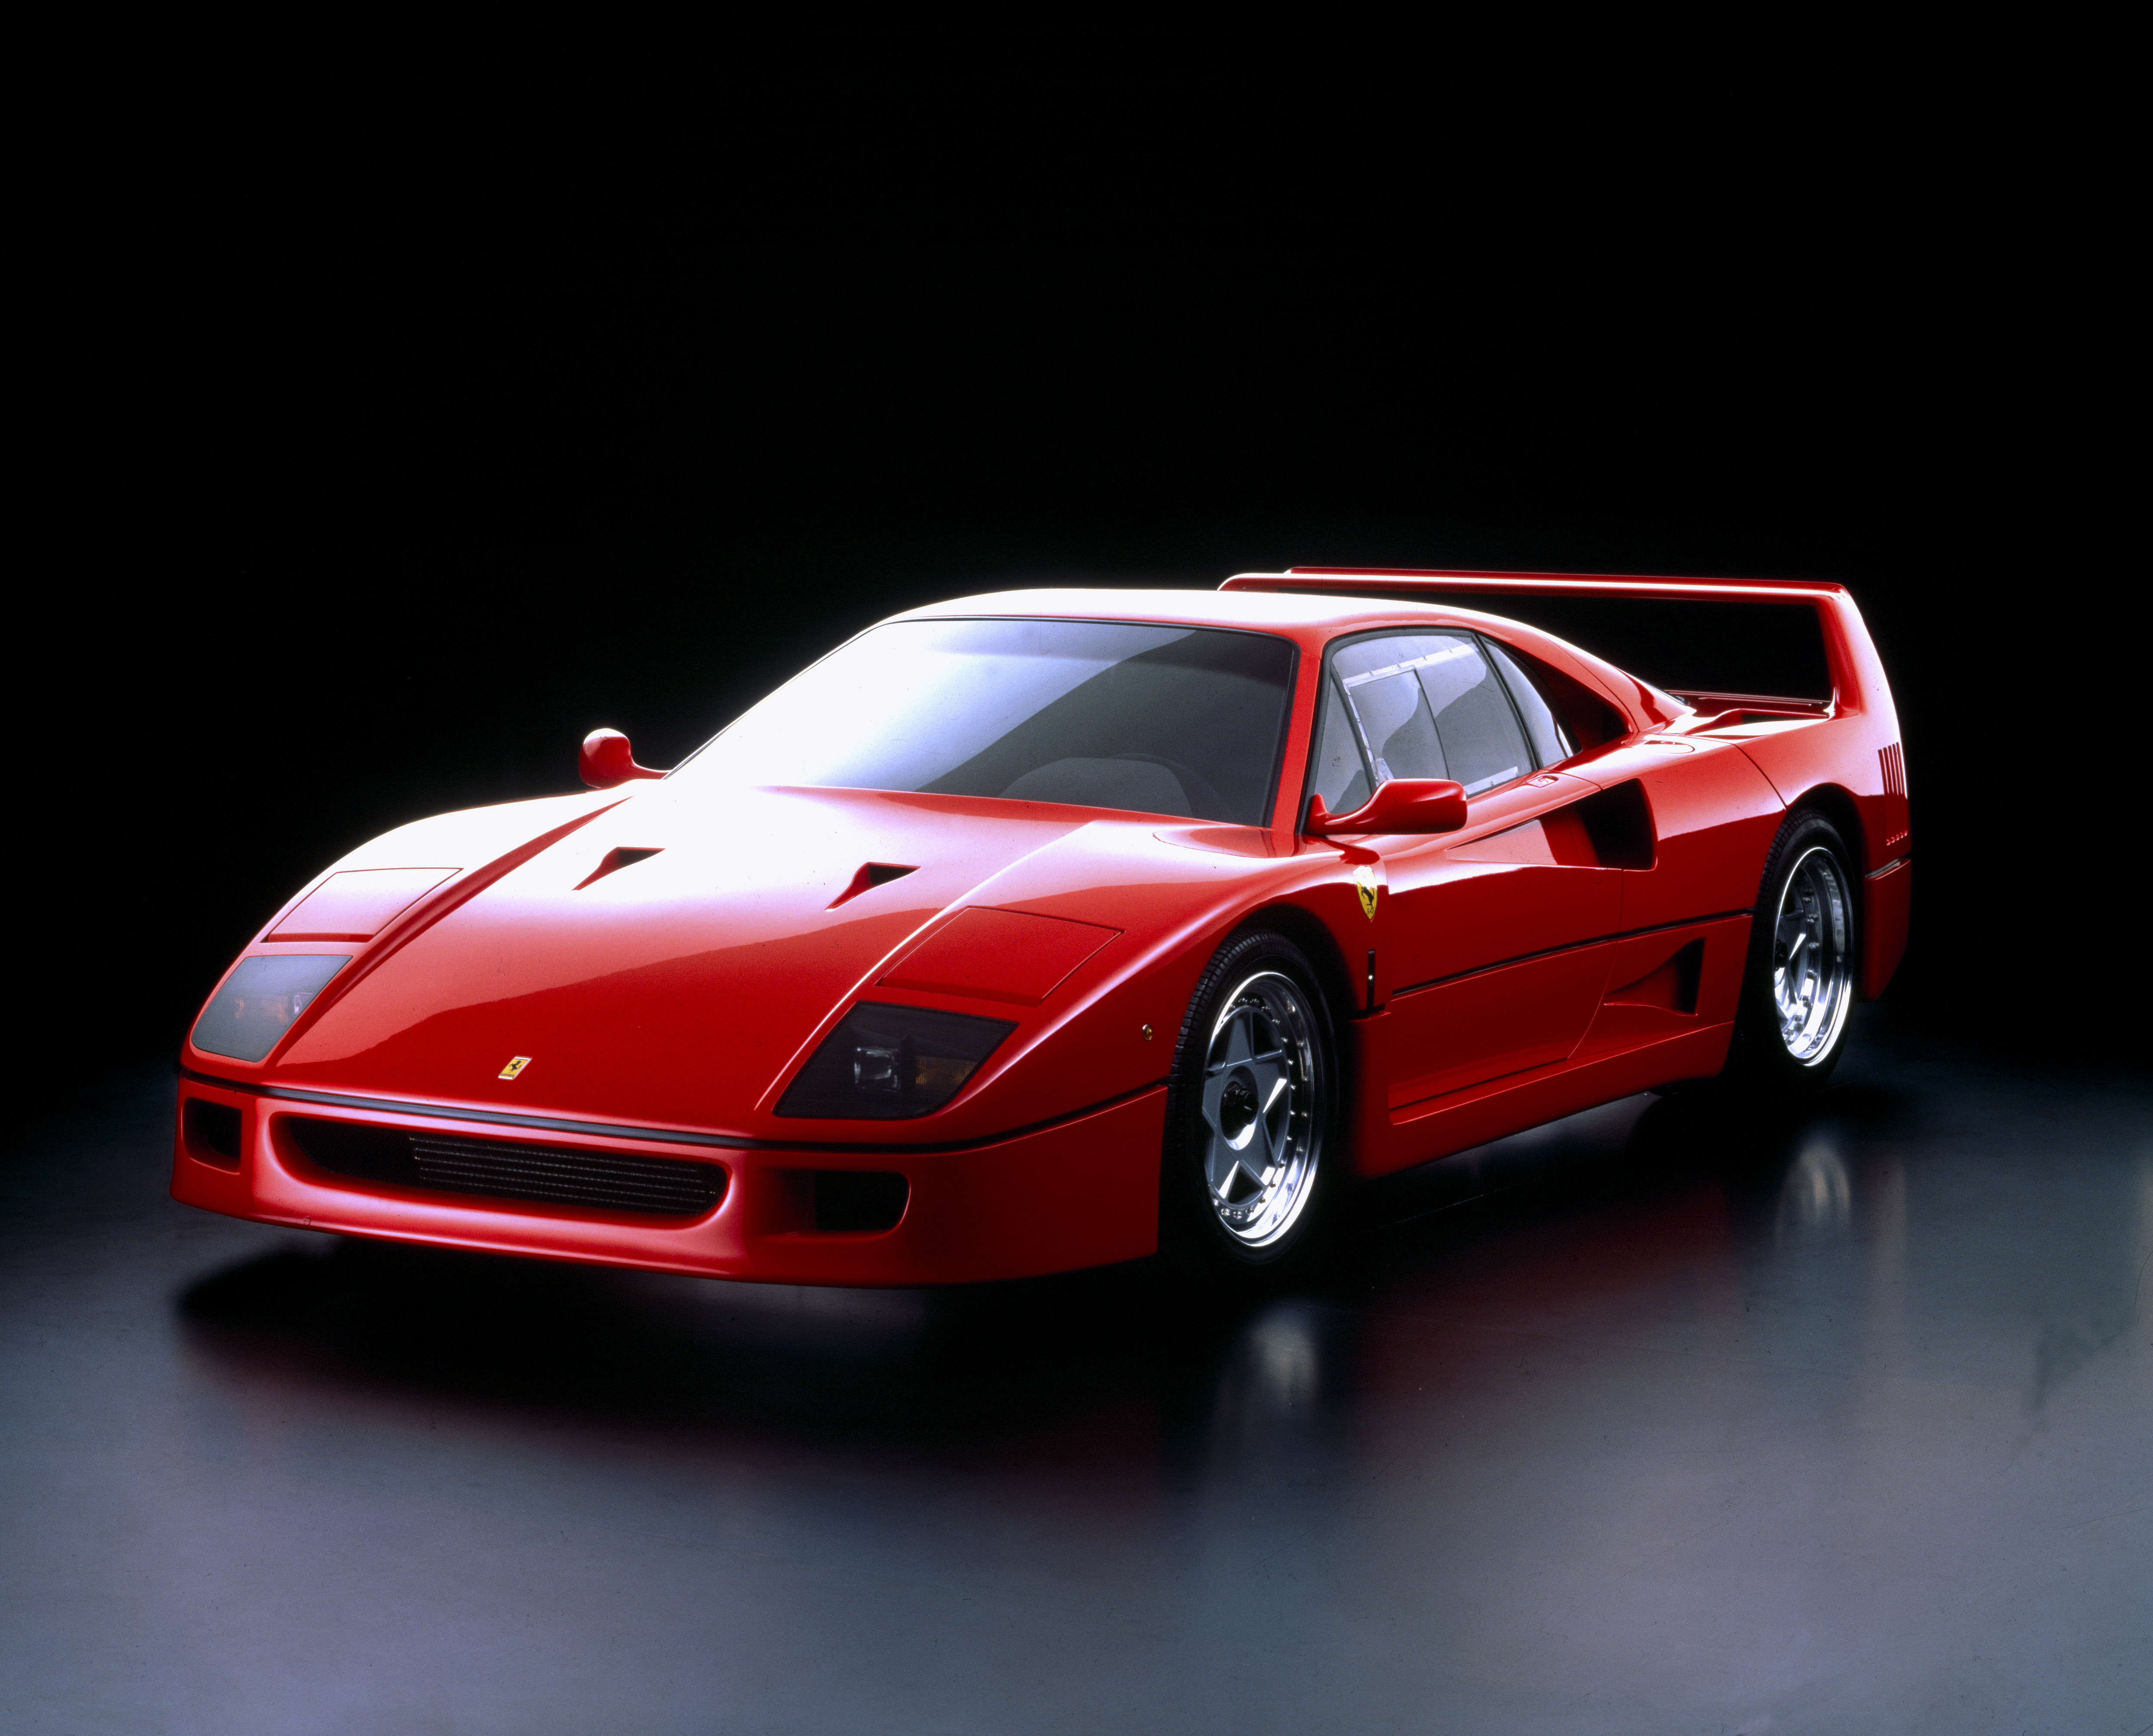 1182_Ferrari_F_40__1987___La_Presse_Ferrari_Spa.jpg